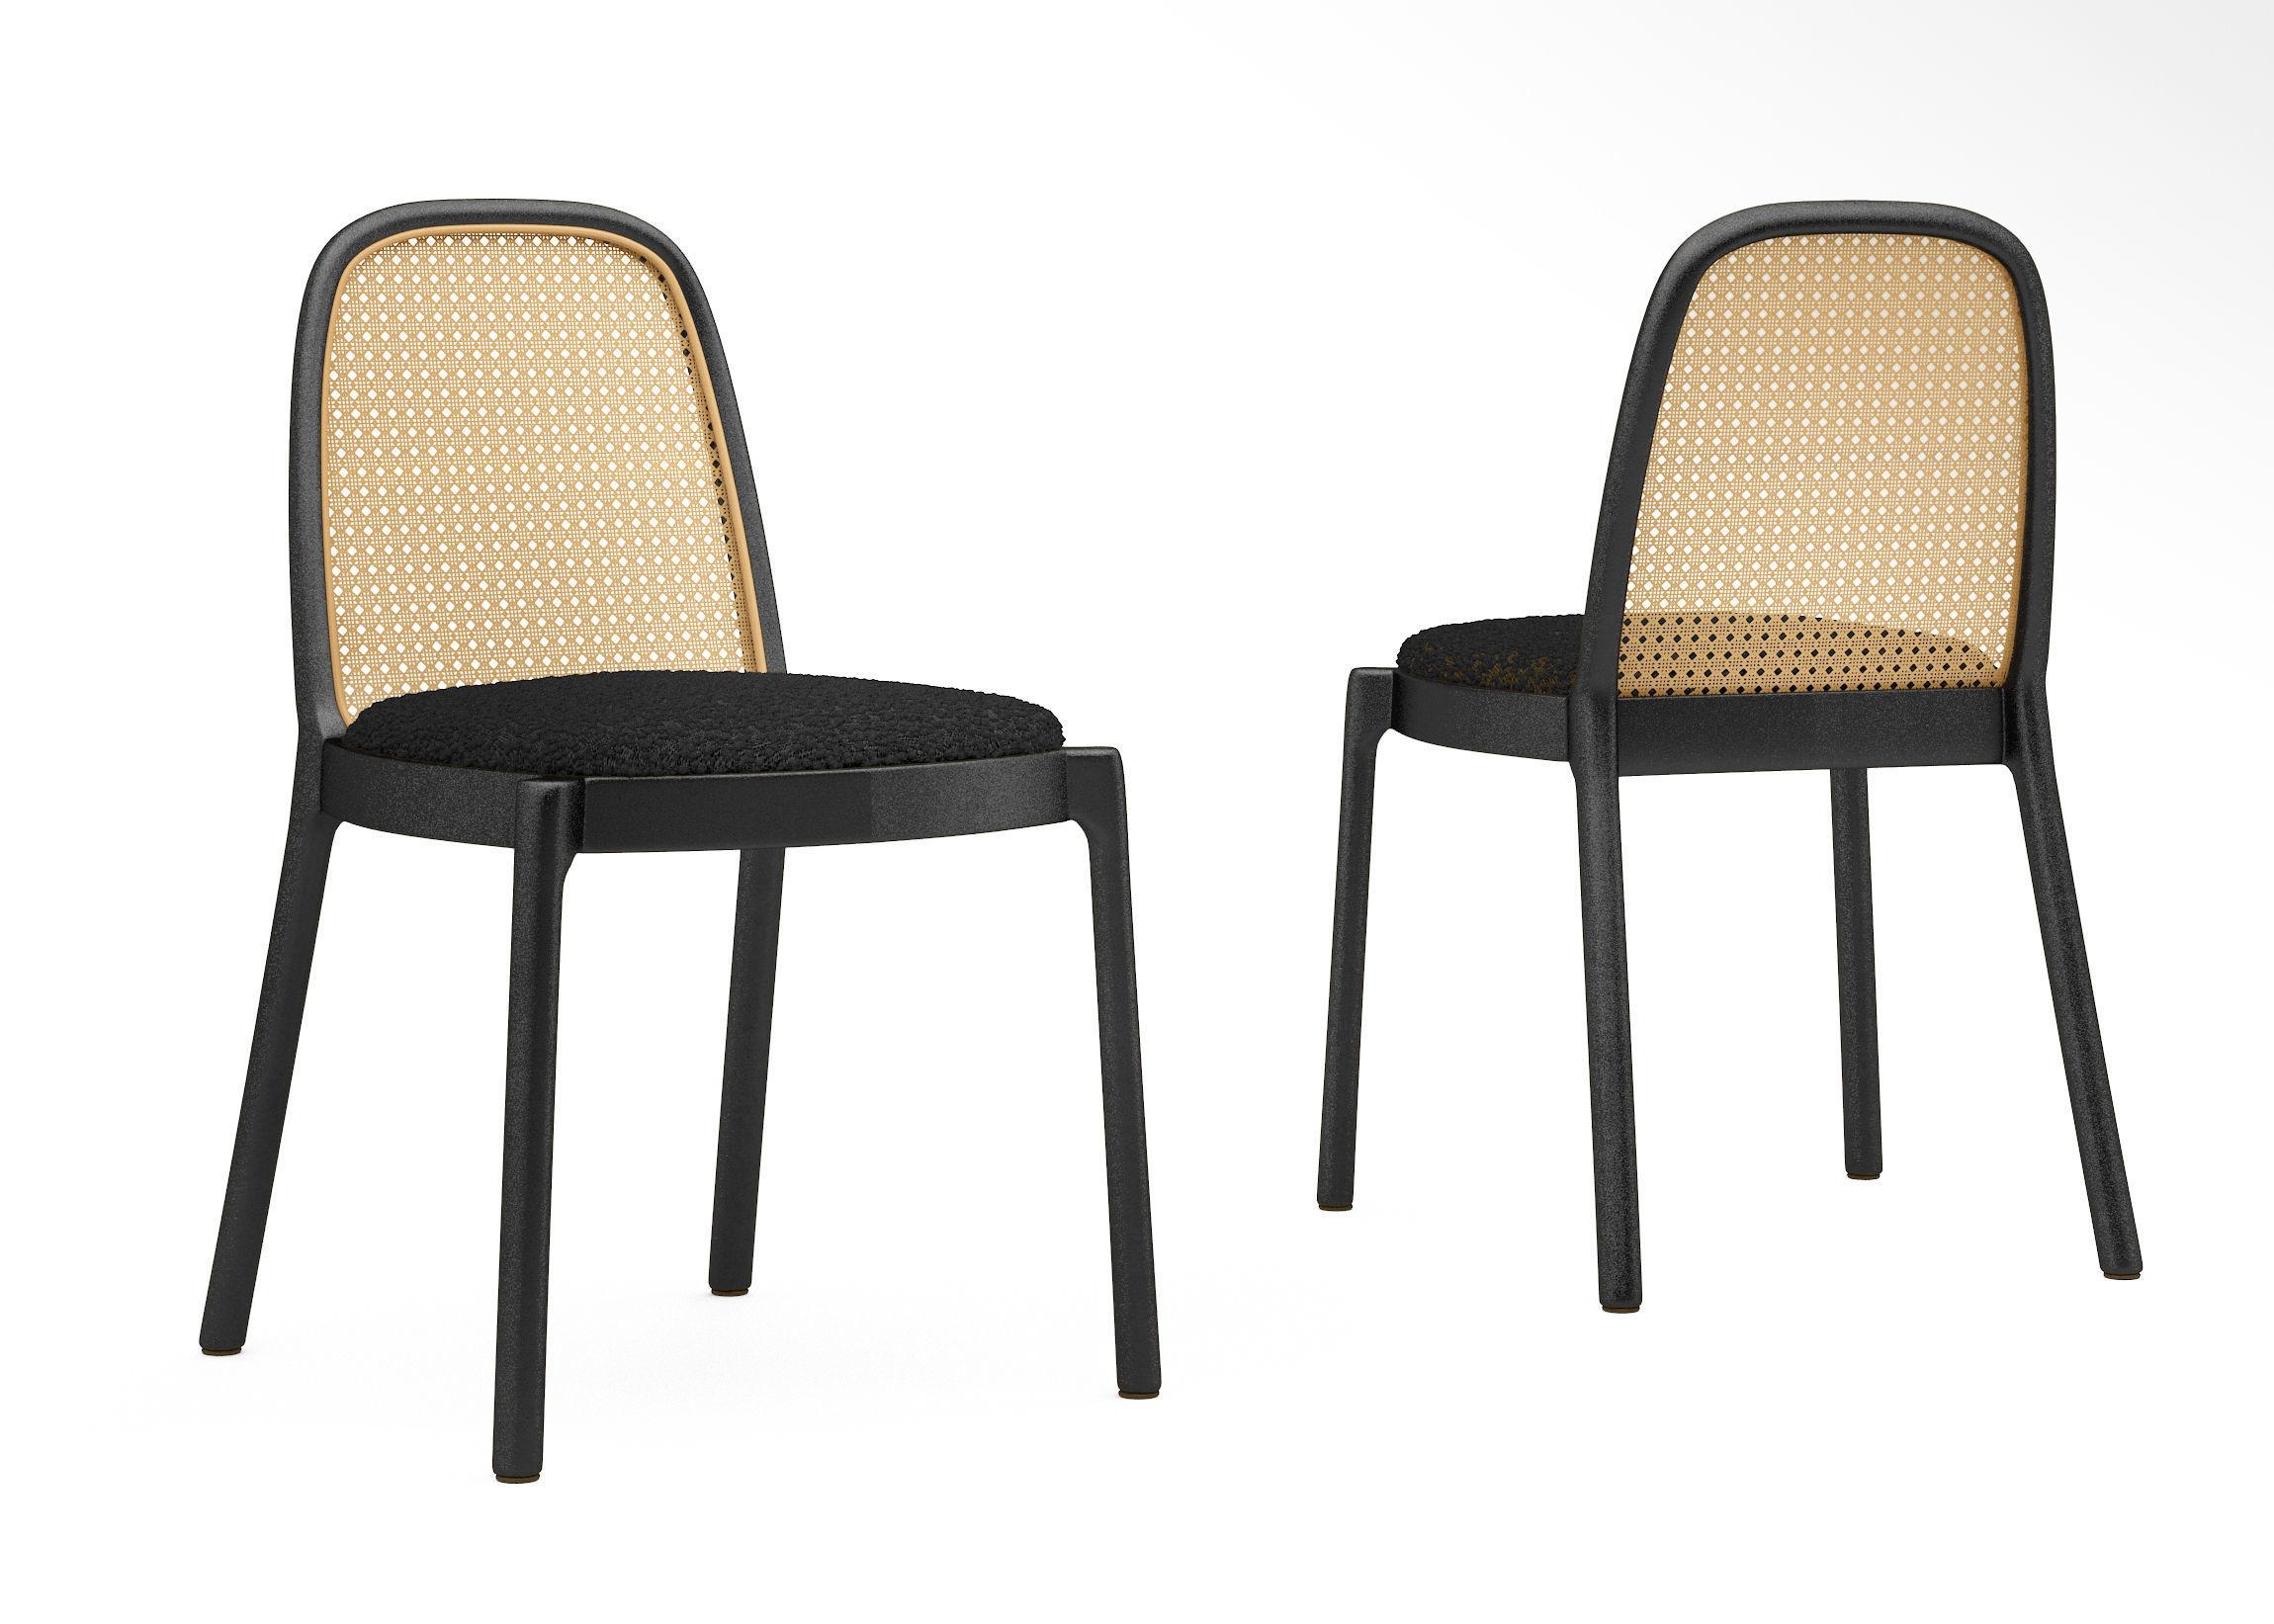 CB2 Nadia Cane chair